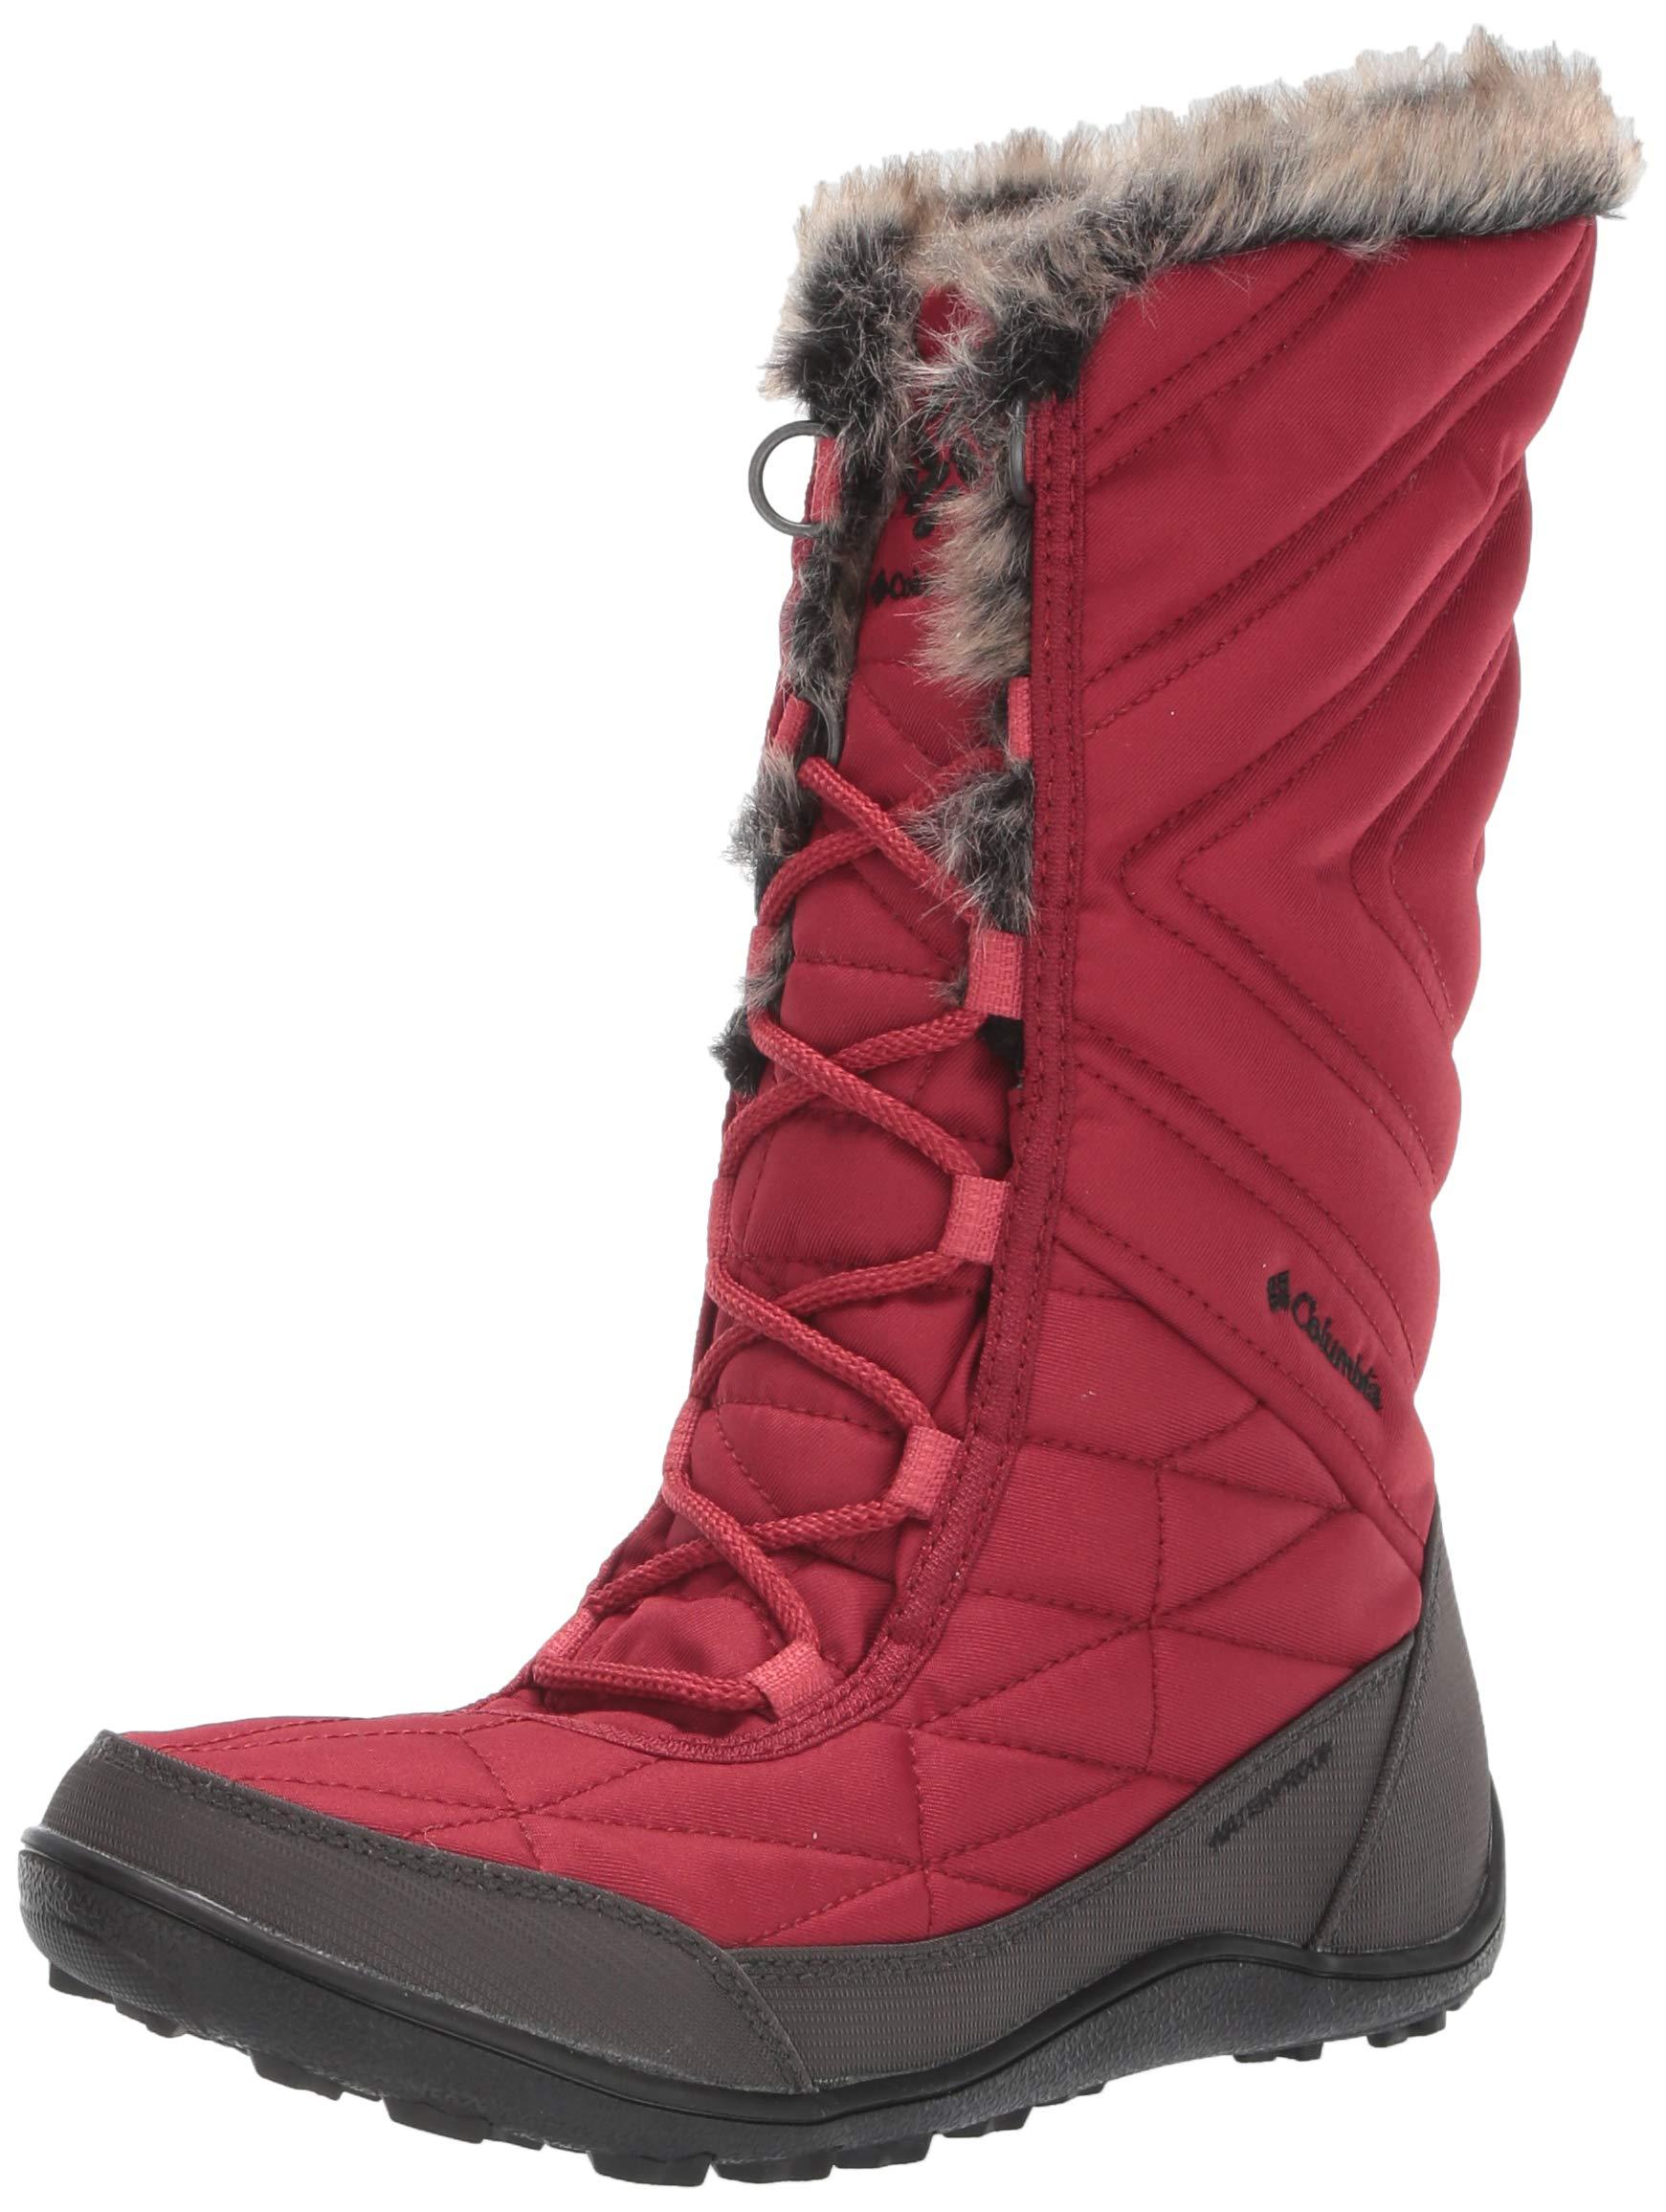 Columbia Women's Minx Iii Mid Calf Boot